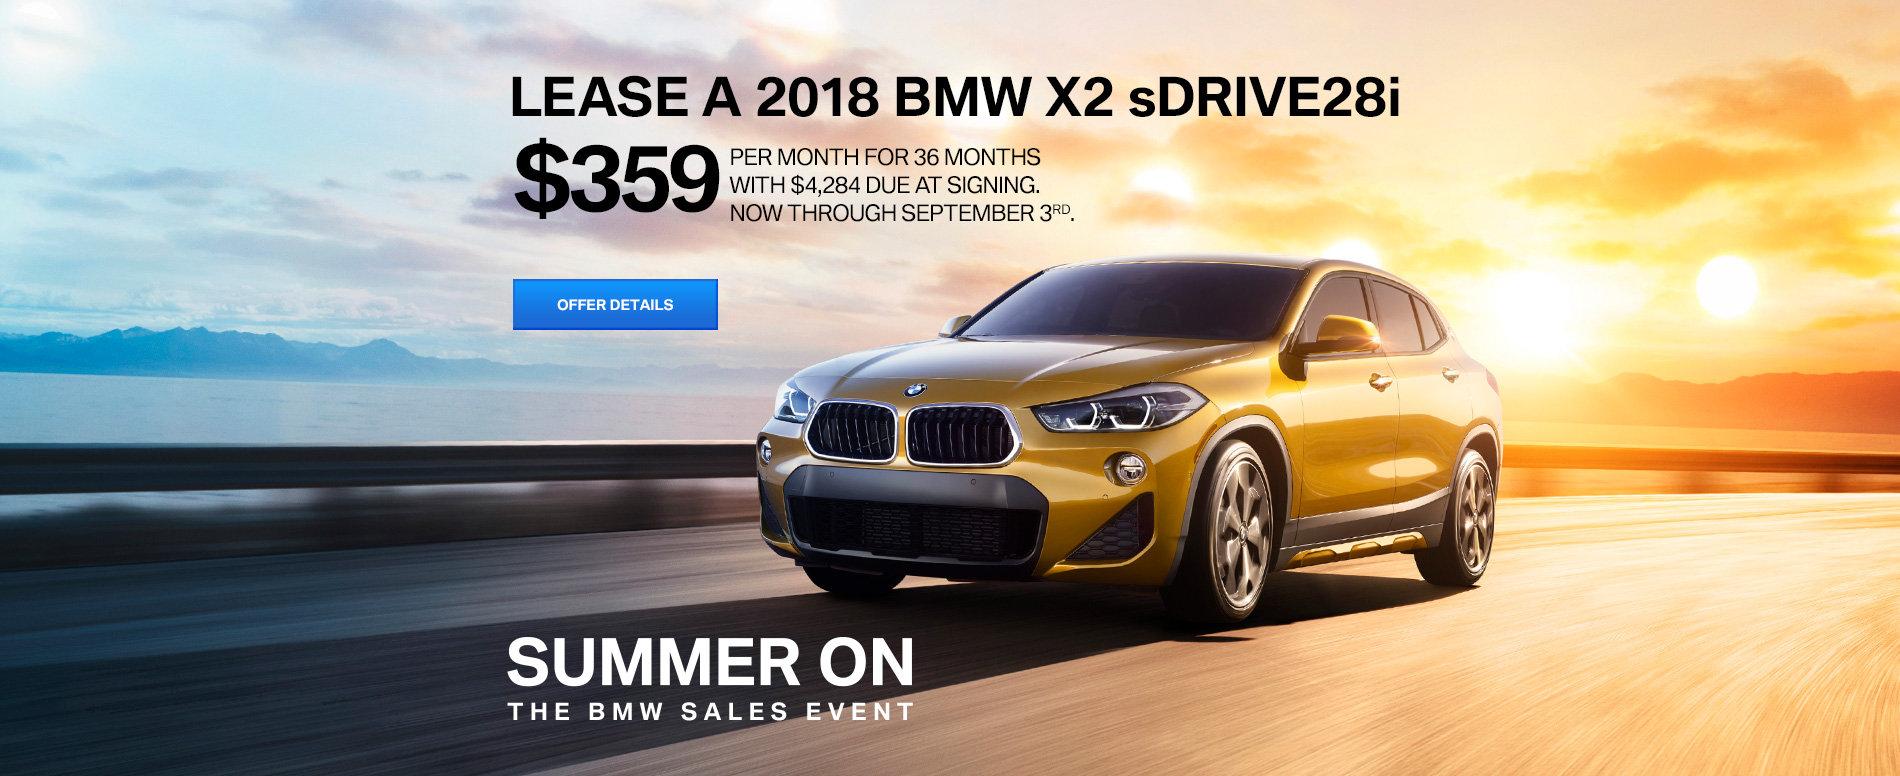 BMW New & Used Car Dealer - Orange County, Irvine, Huntington Beach ...